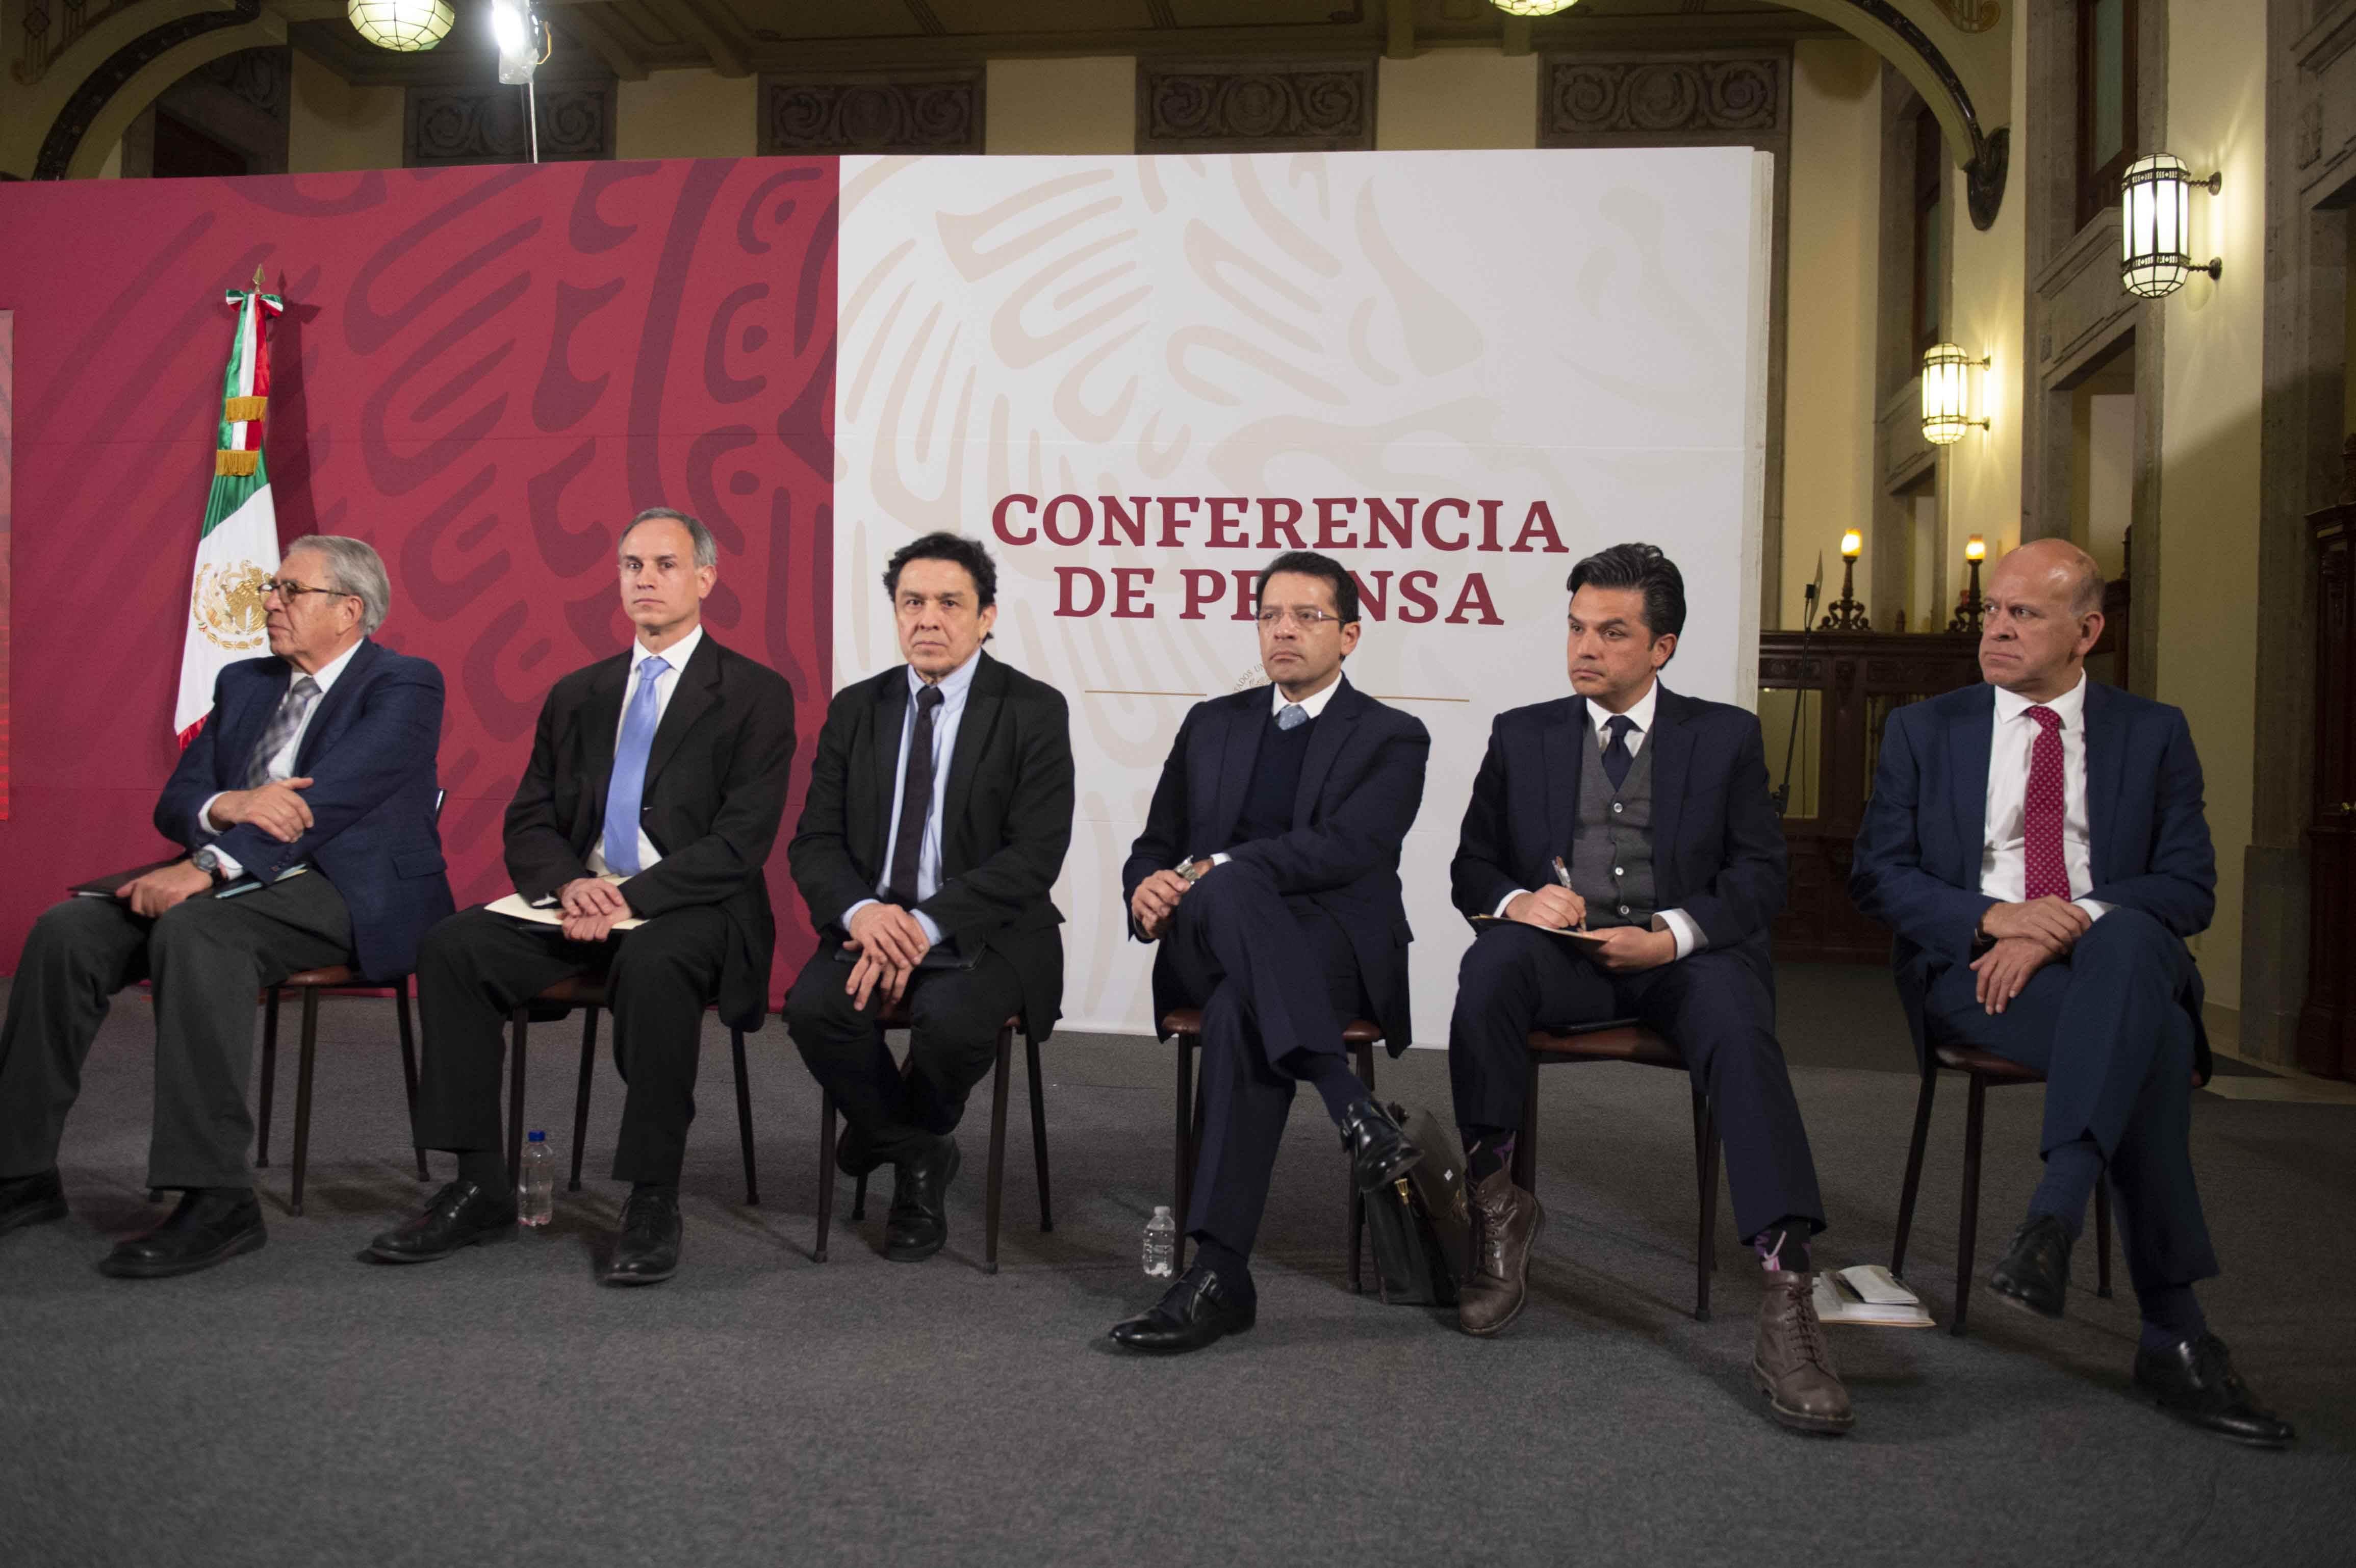 Conferencia de Prensa Matutina; martes 25 de febrero, 2020